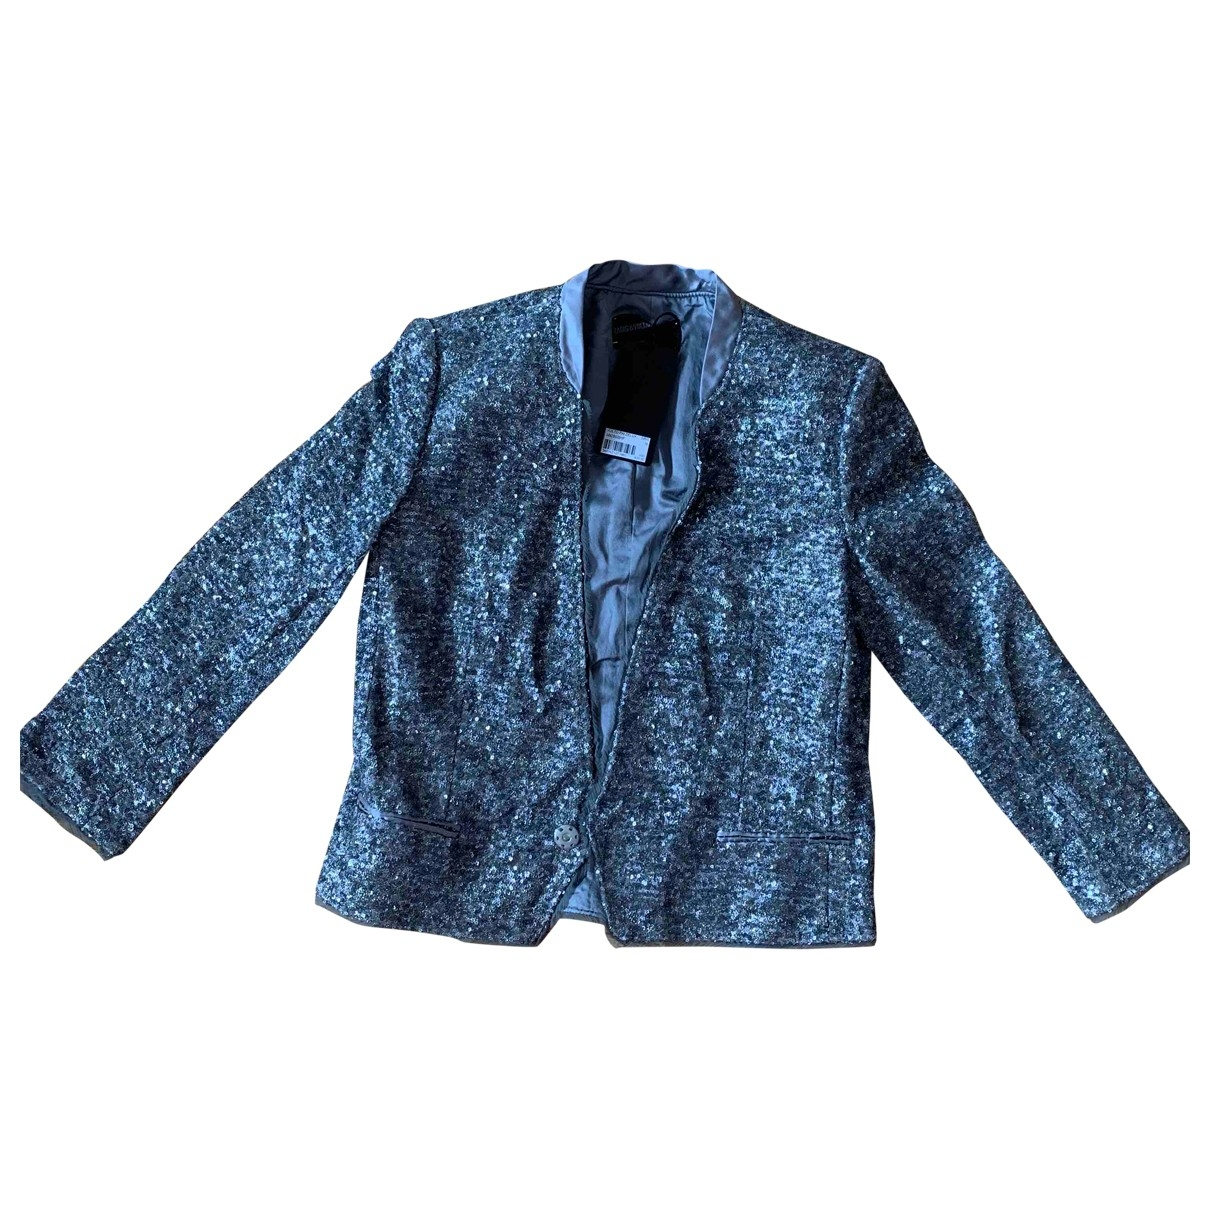 Zadig & Voltaire \N Grey Glitter jacket for Women 36 FR